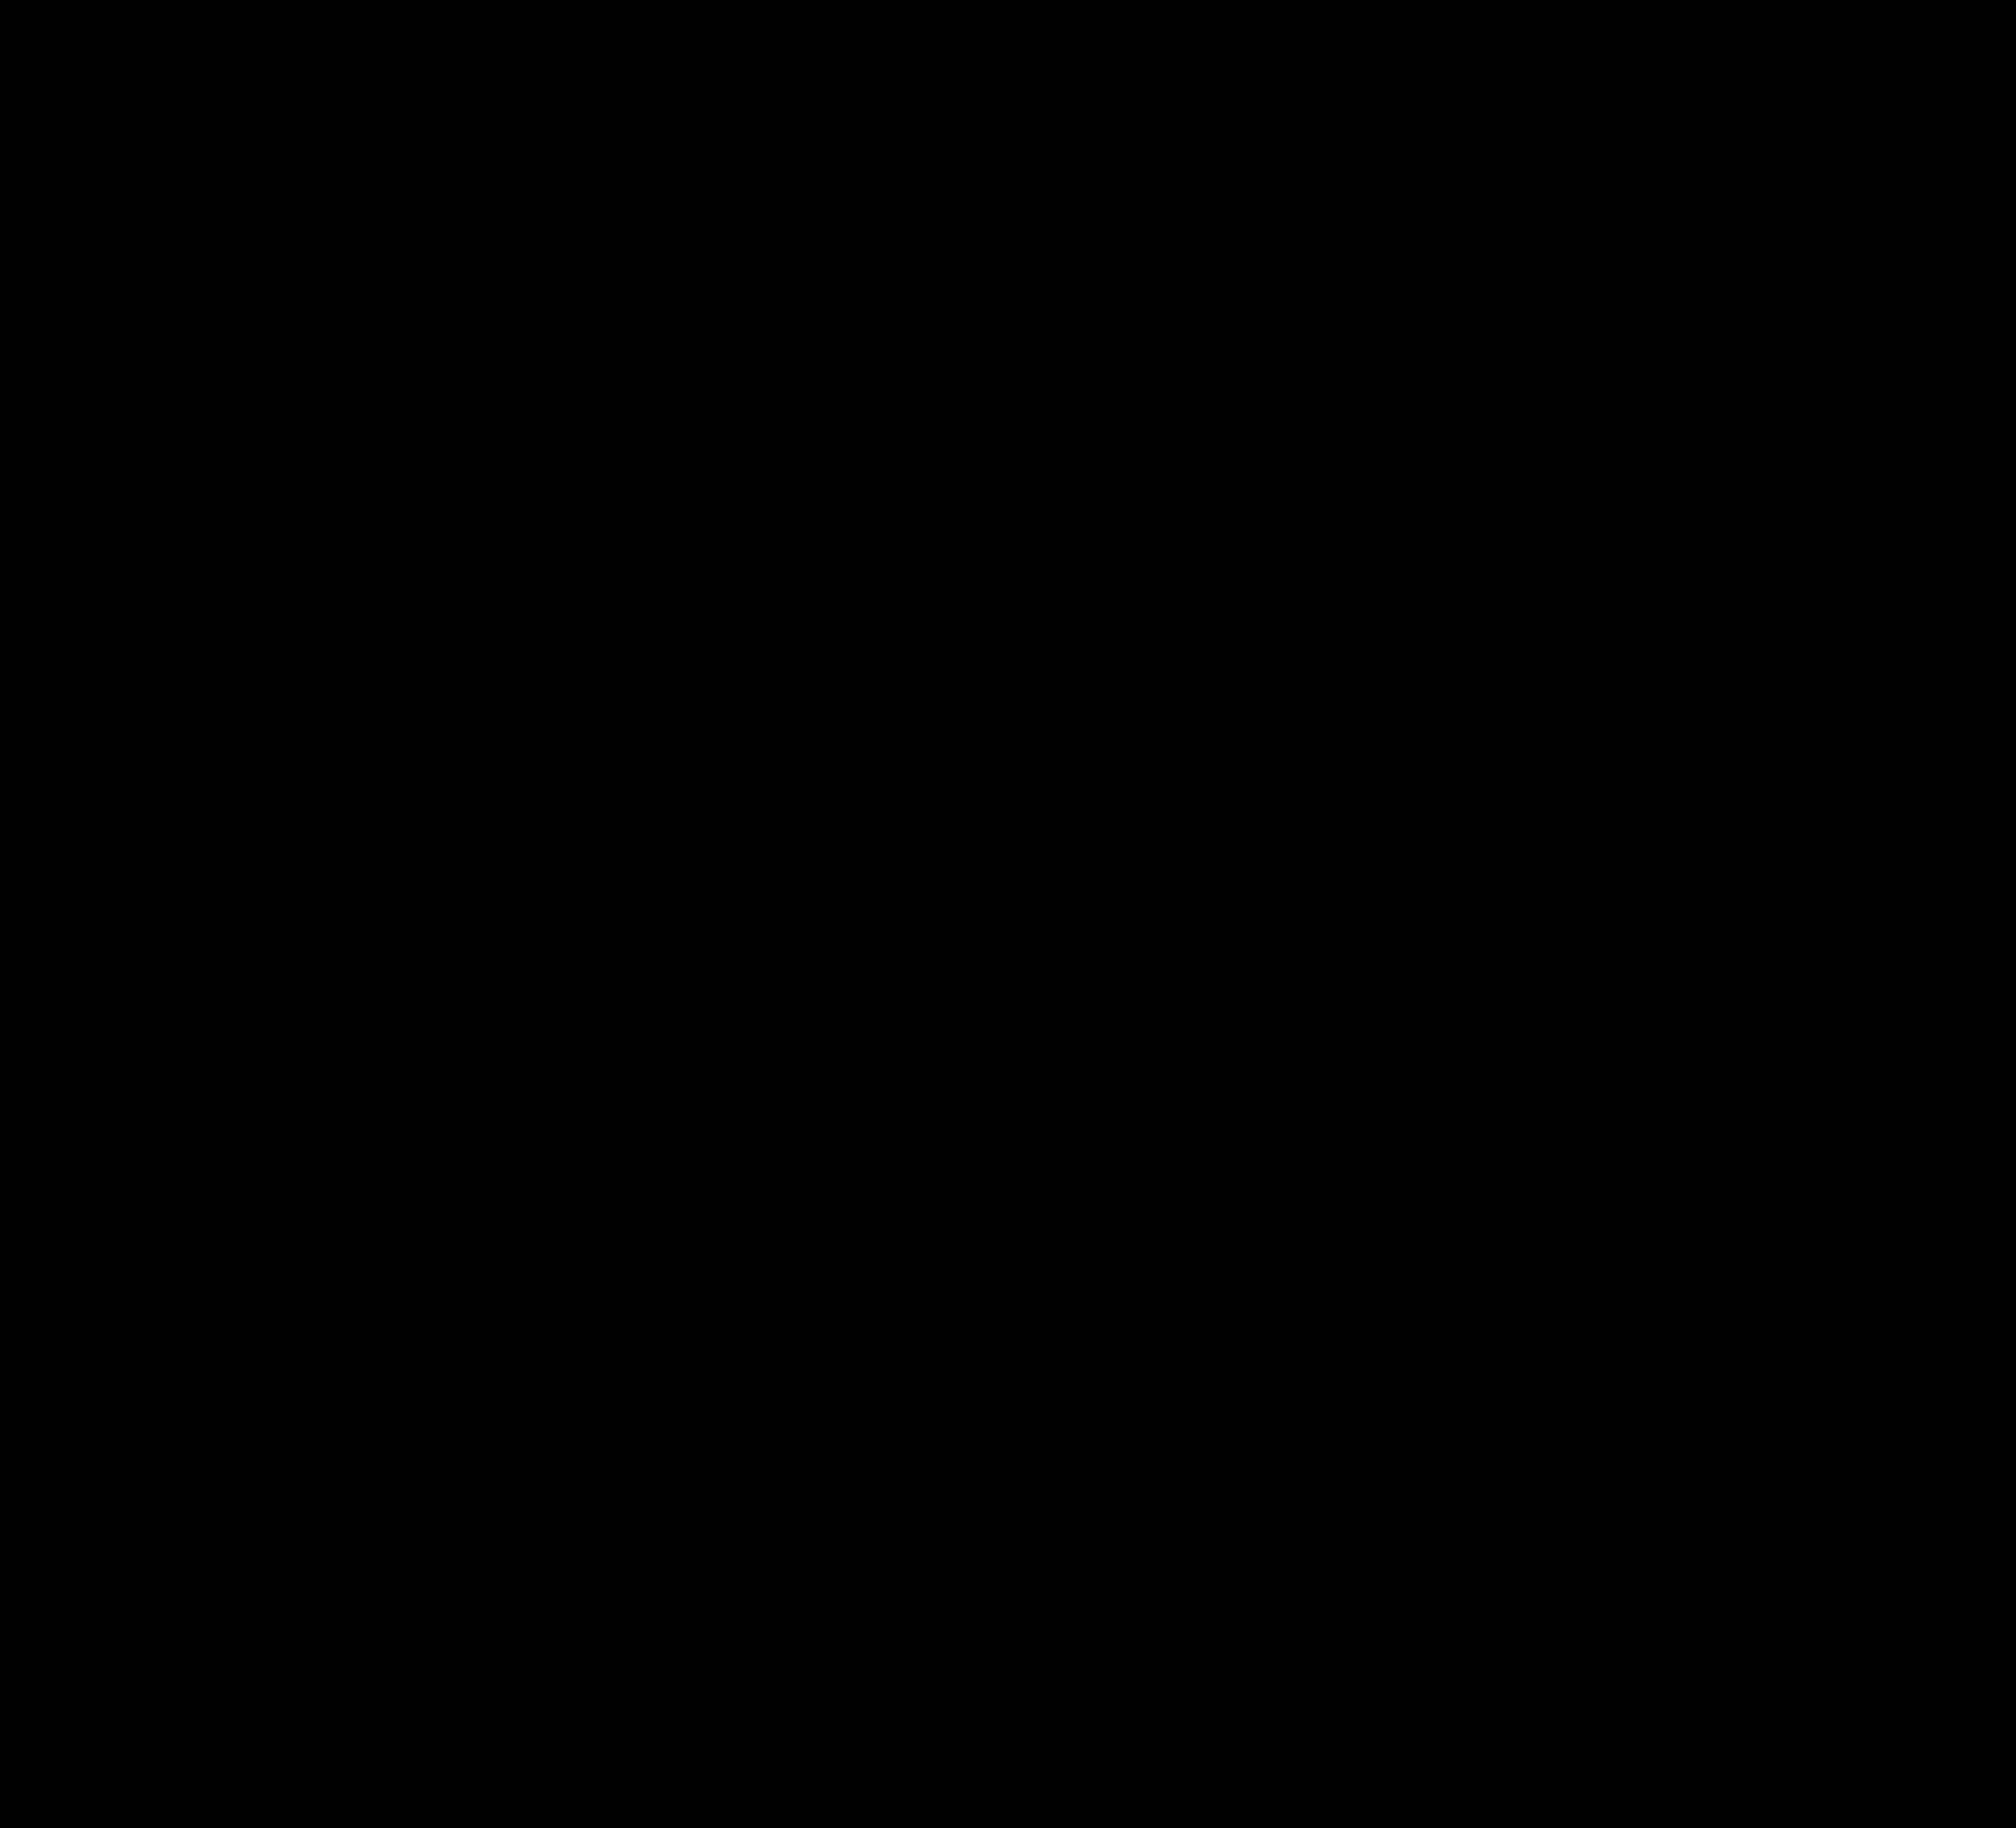 Heart Logo PNG Transparent & SVG Vector - Freebie Supply